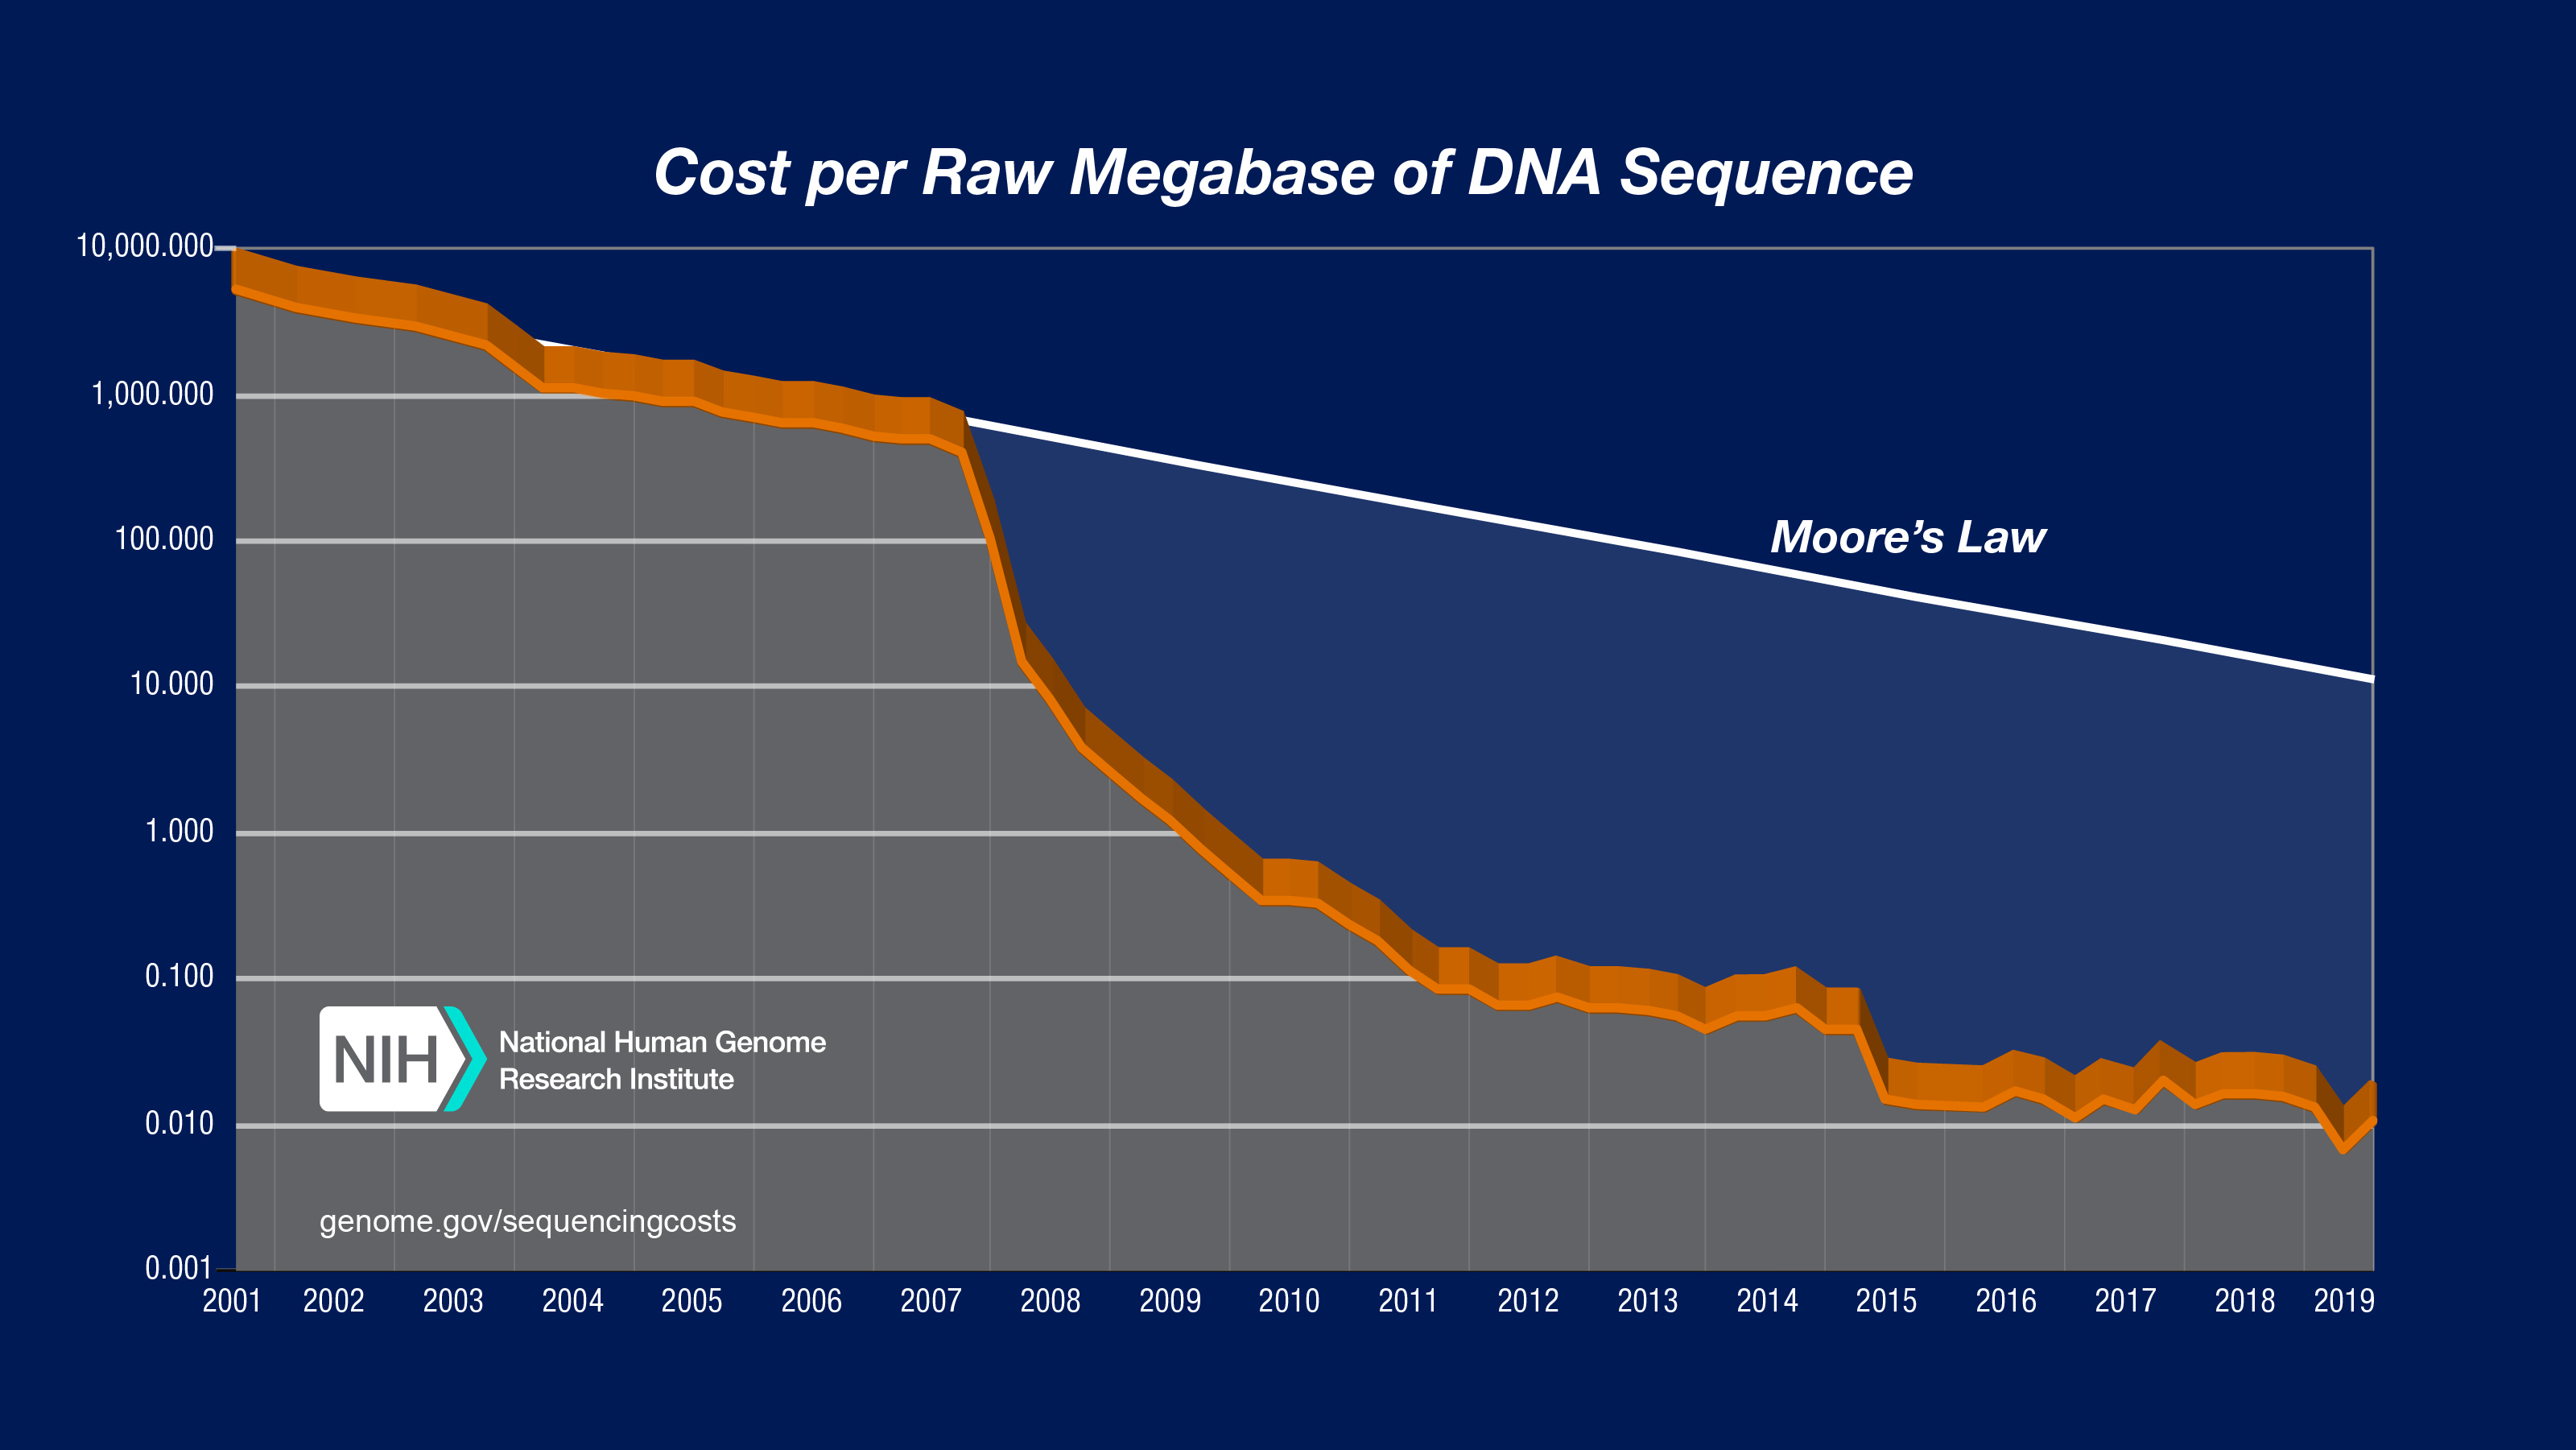 Sequencing Cost Per Megabase